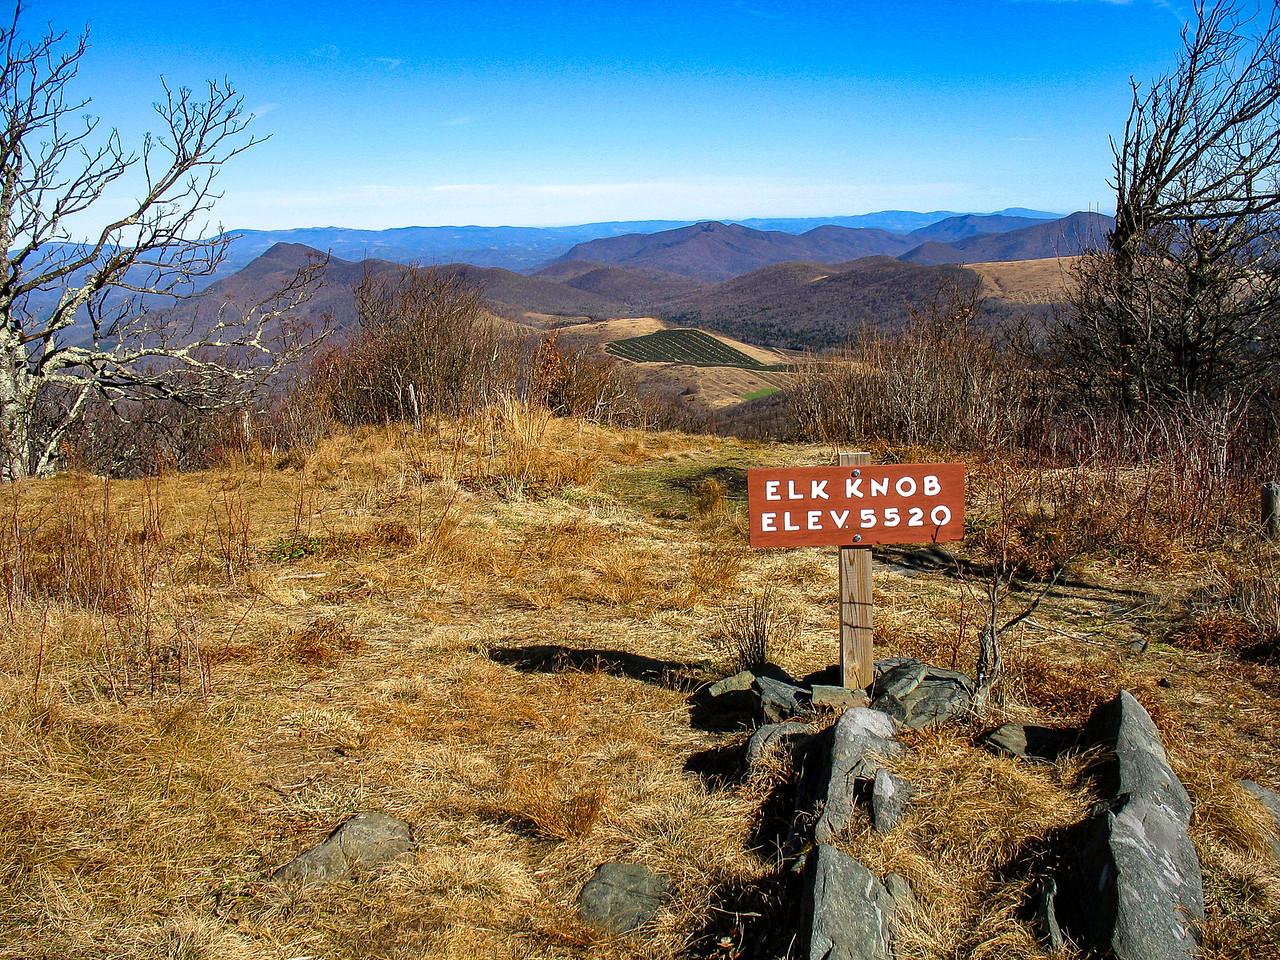 Elk Knob Summit - 5,520'